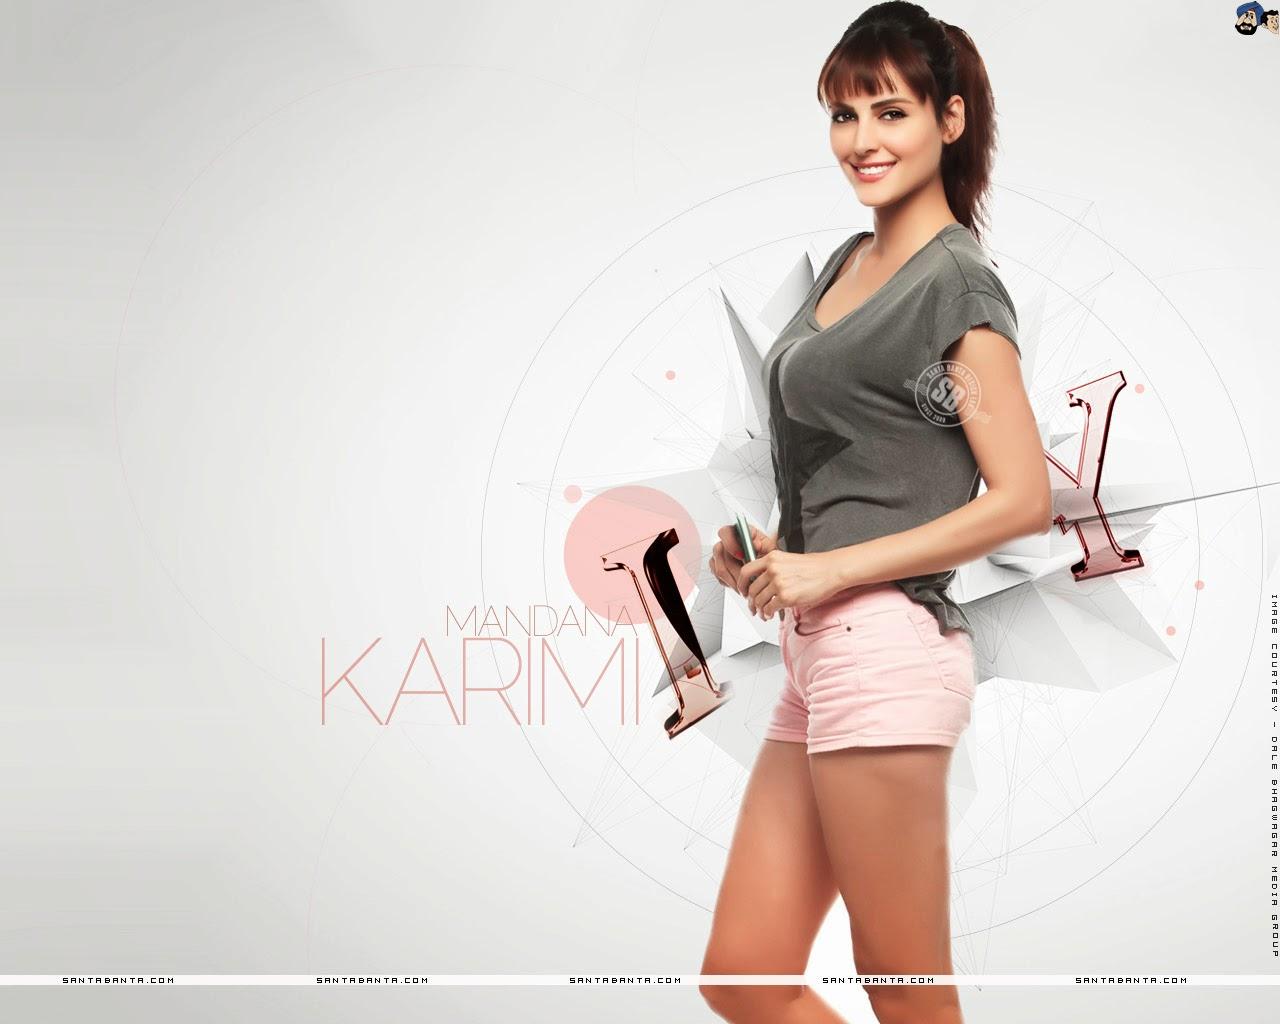 Mandana Karimi Sexy Legs